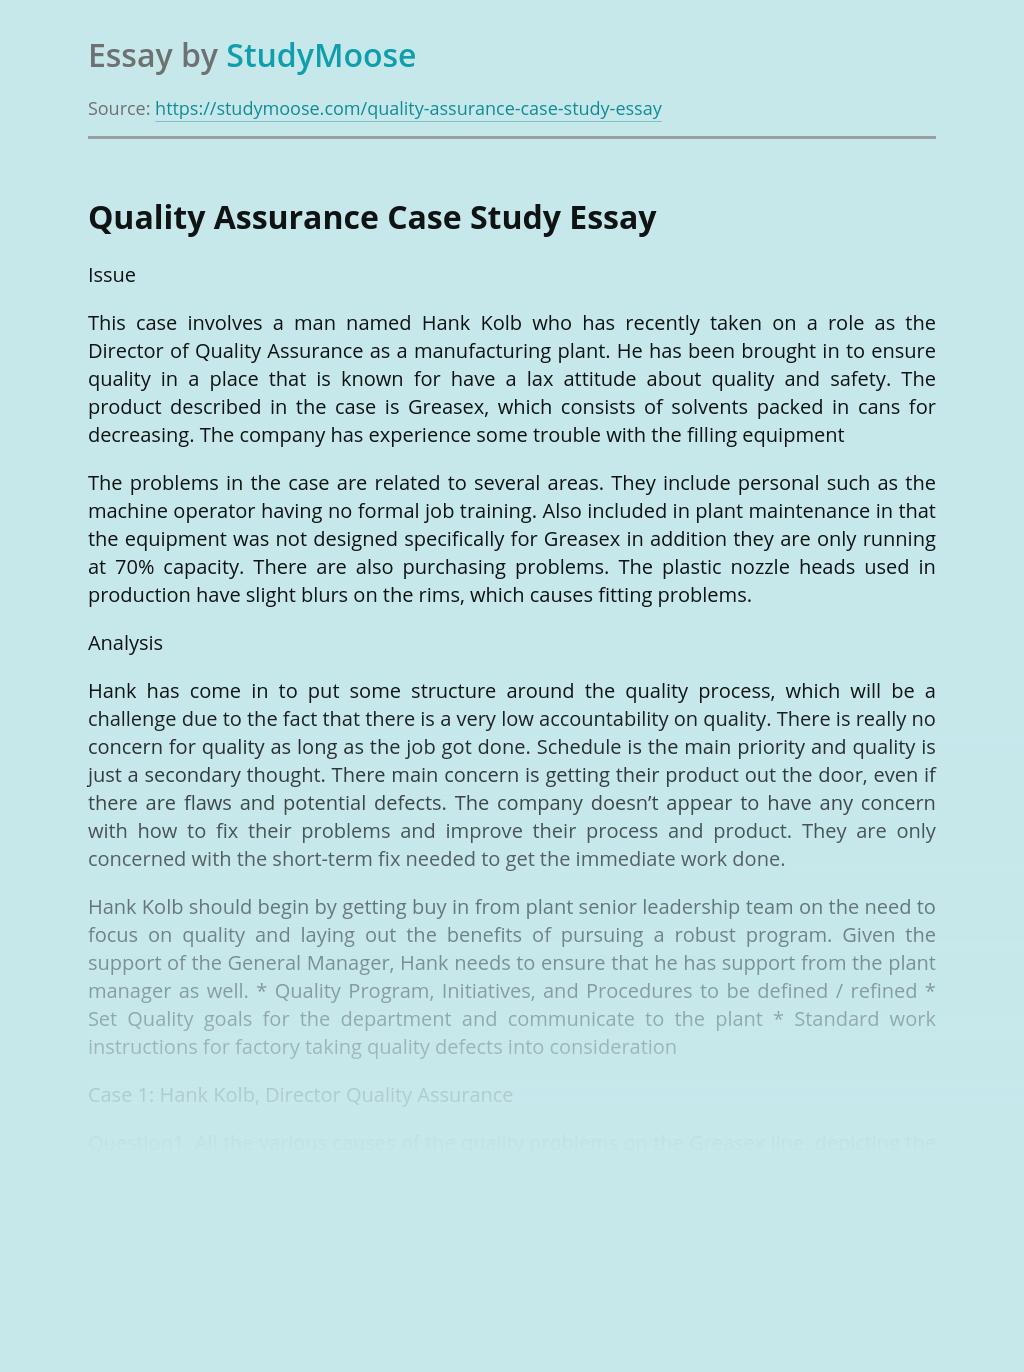 Quality Assurance Case Study